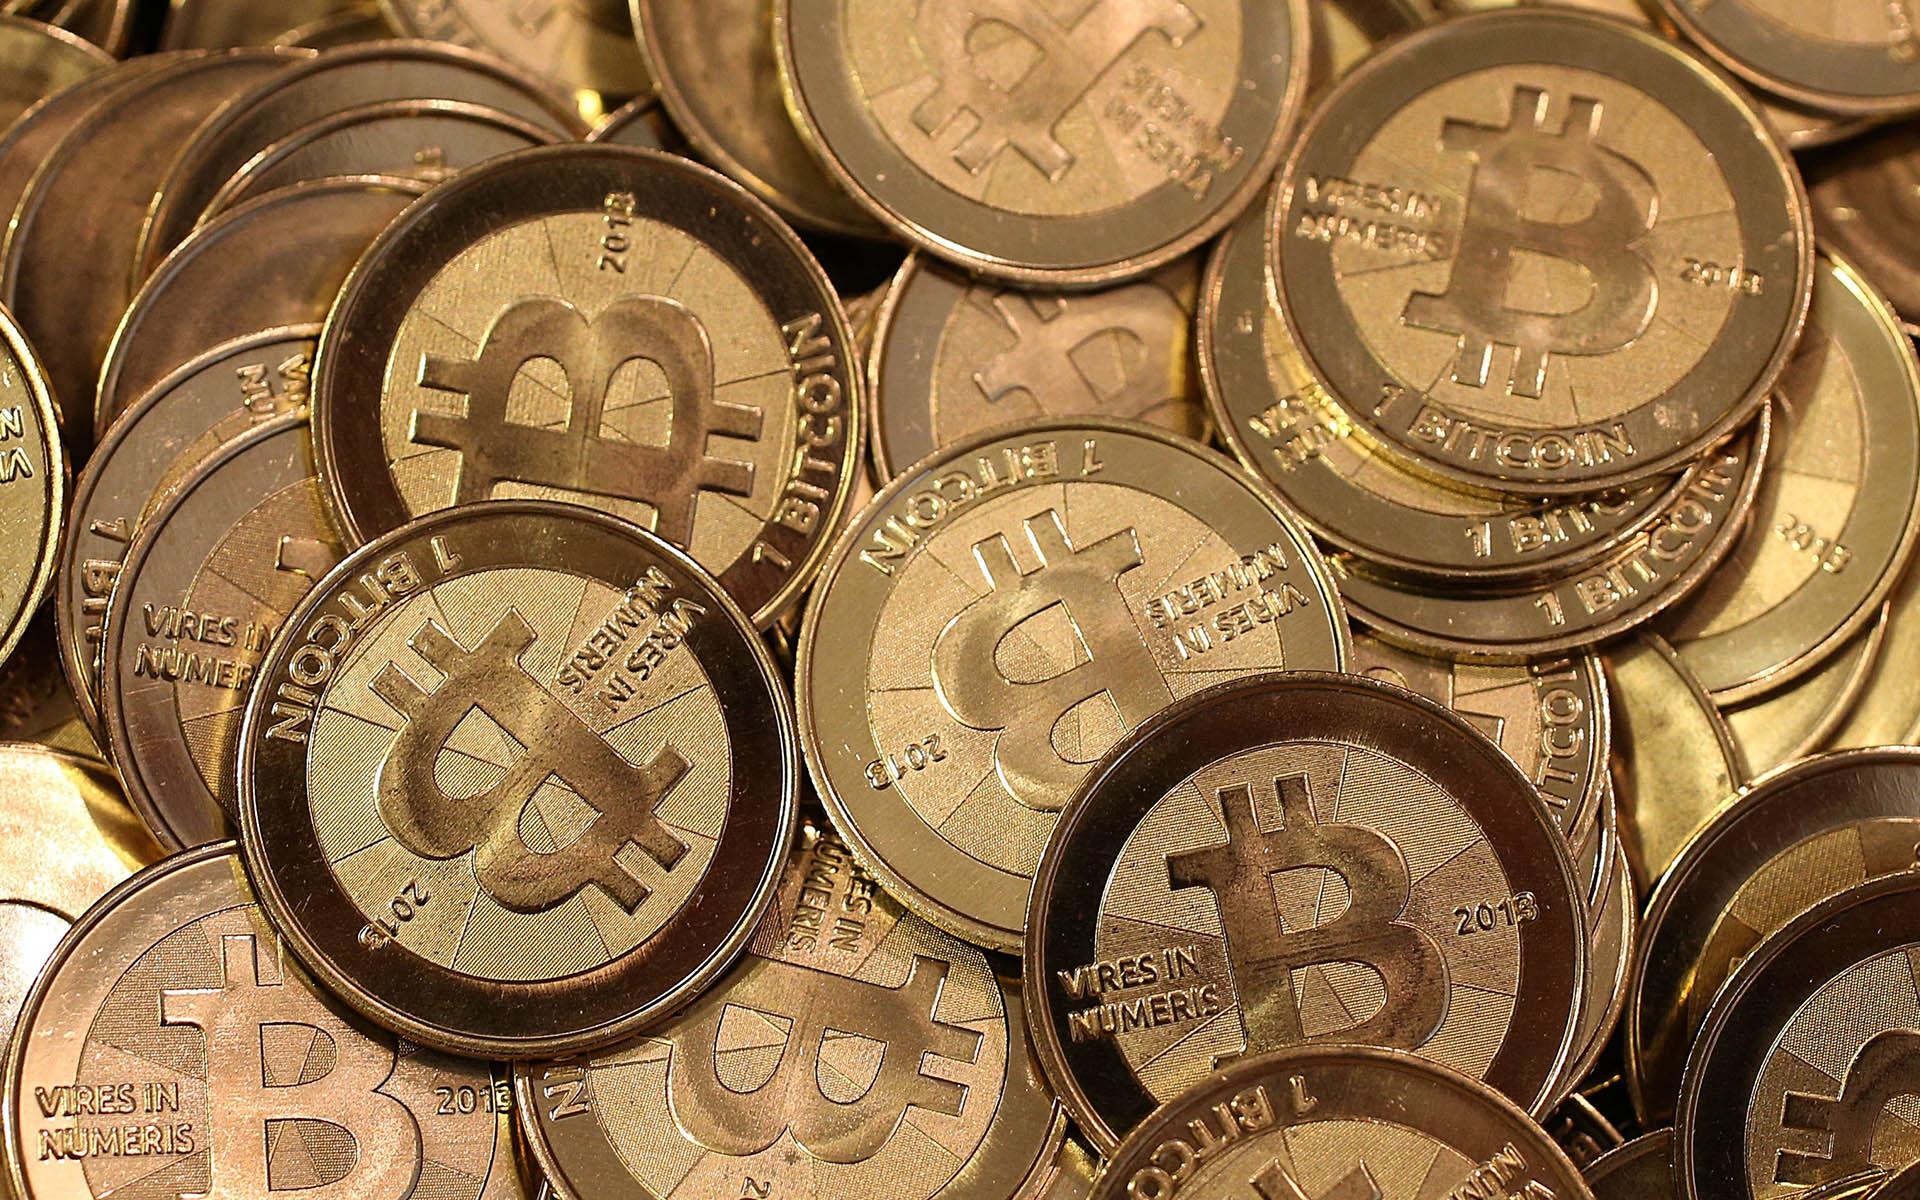 RedistributingOld Coins